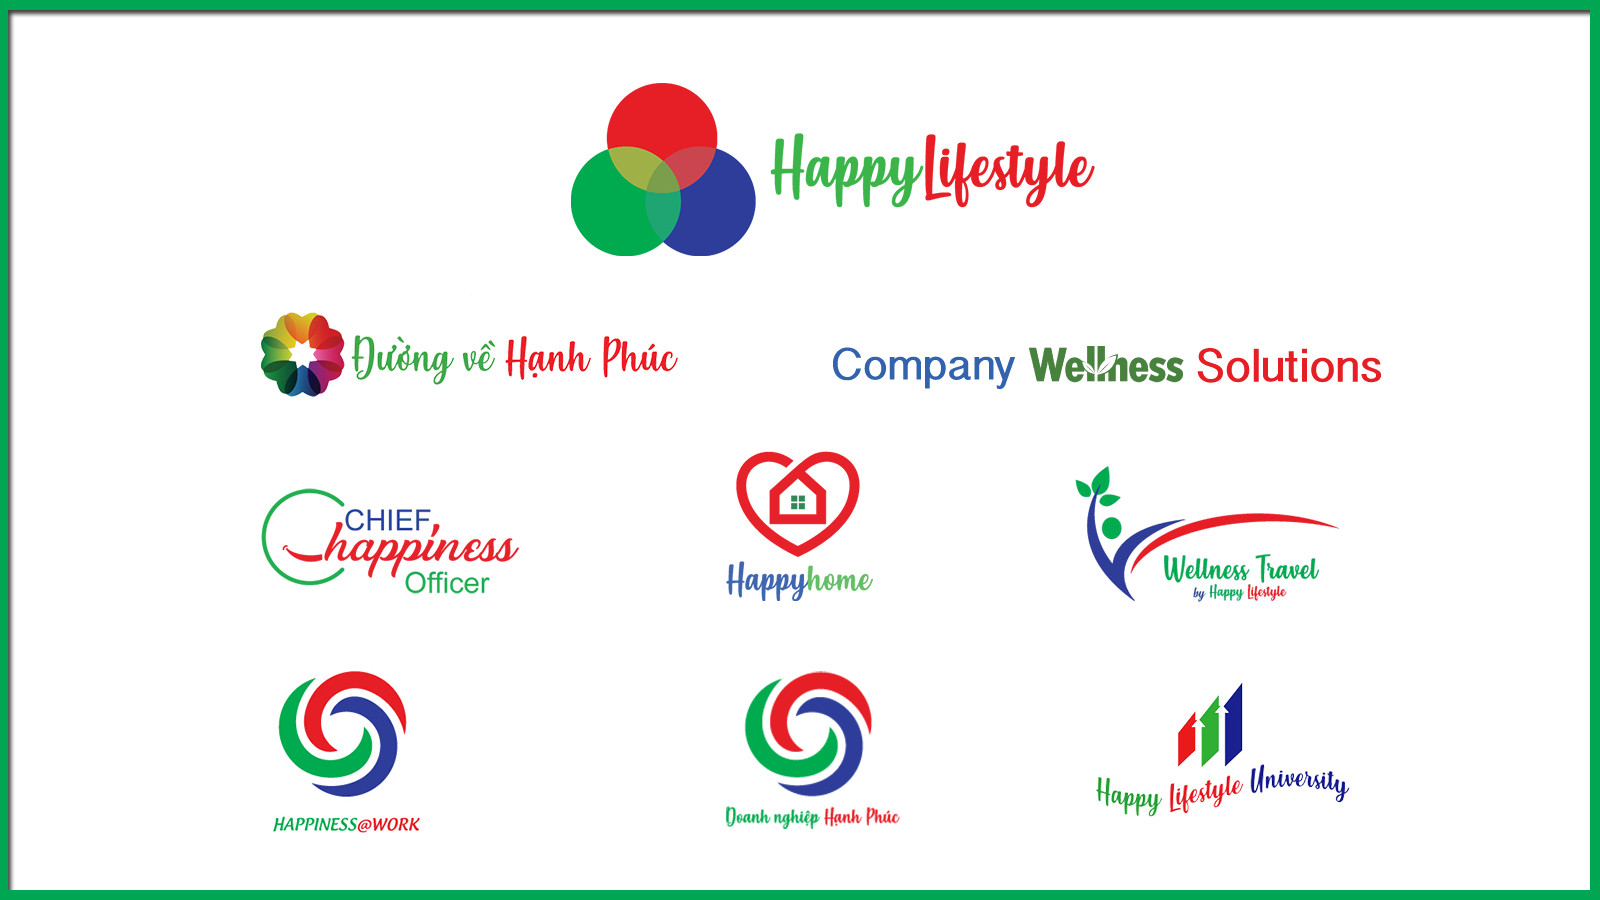 Hệ sinh thái của công ty Happy Lifestyle